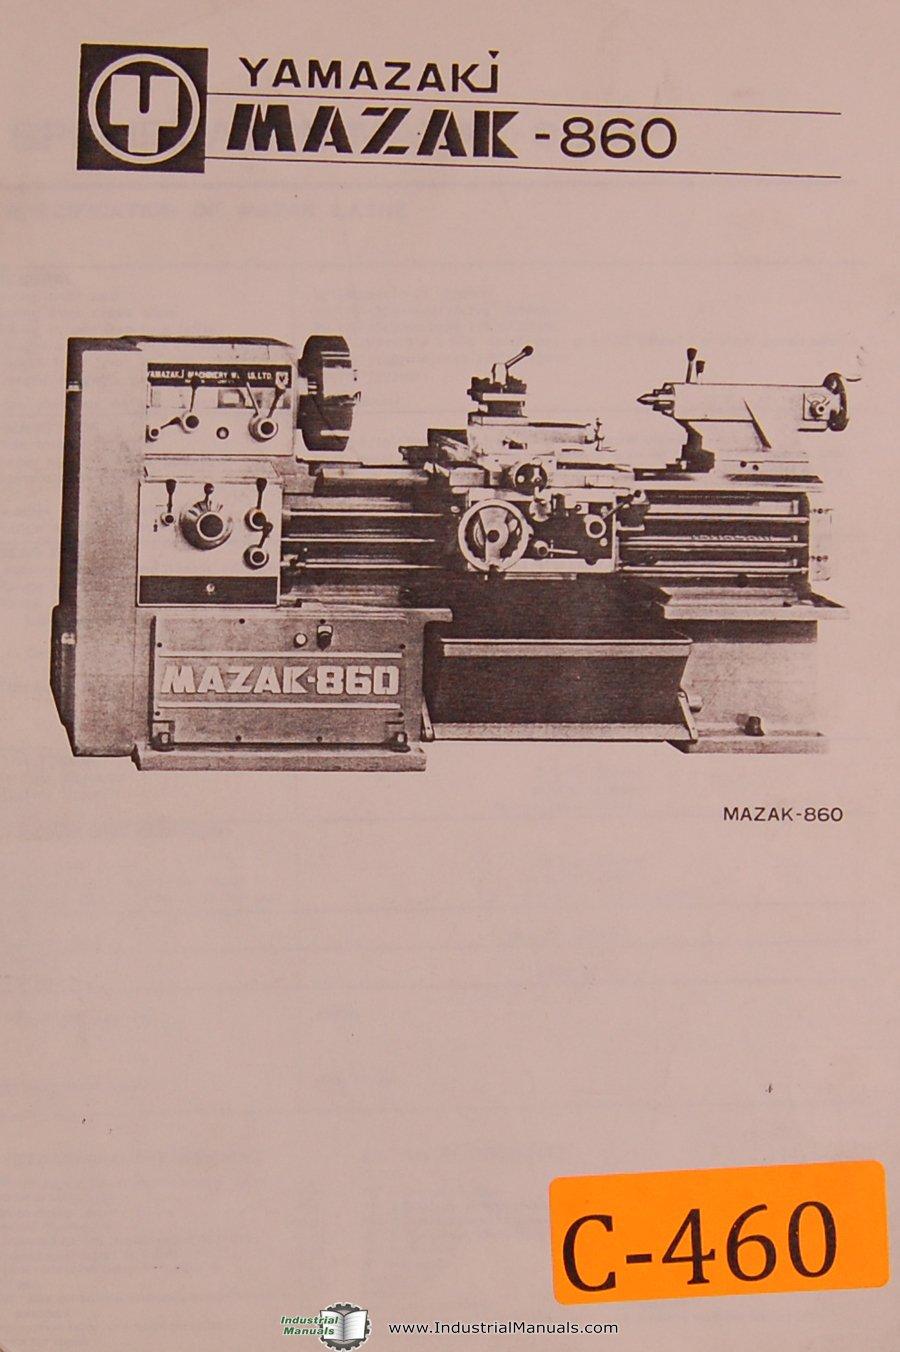 Mazak Yamazaki 860 Lathe, Installation, Wiring Lubrication and Parts Manual:  Mazak: Amazon.com: Books